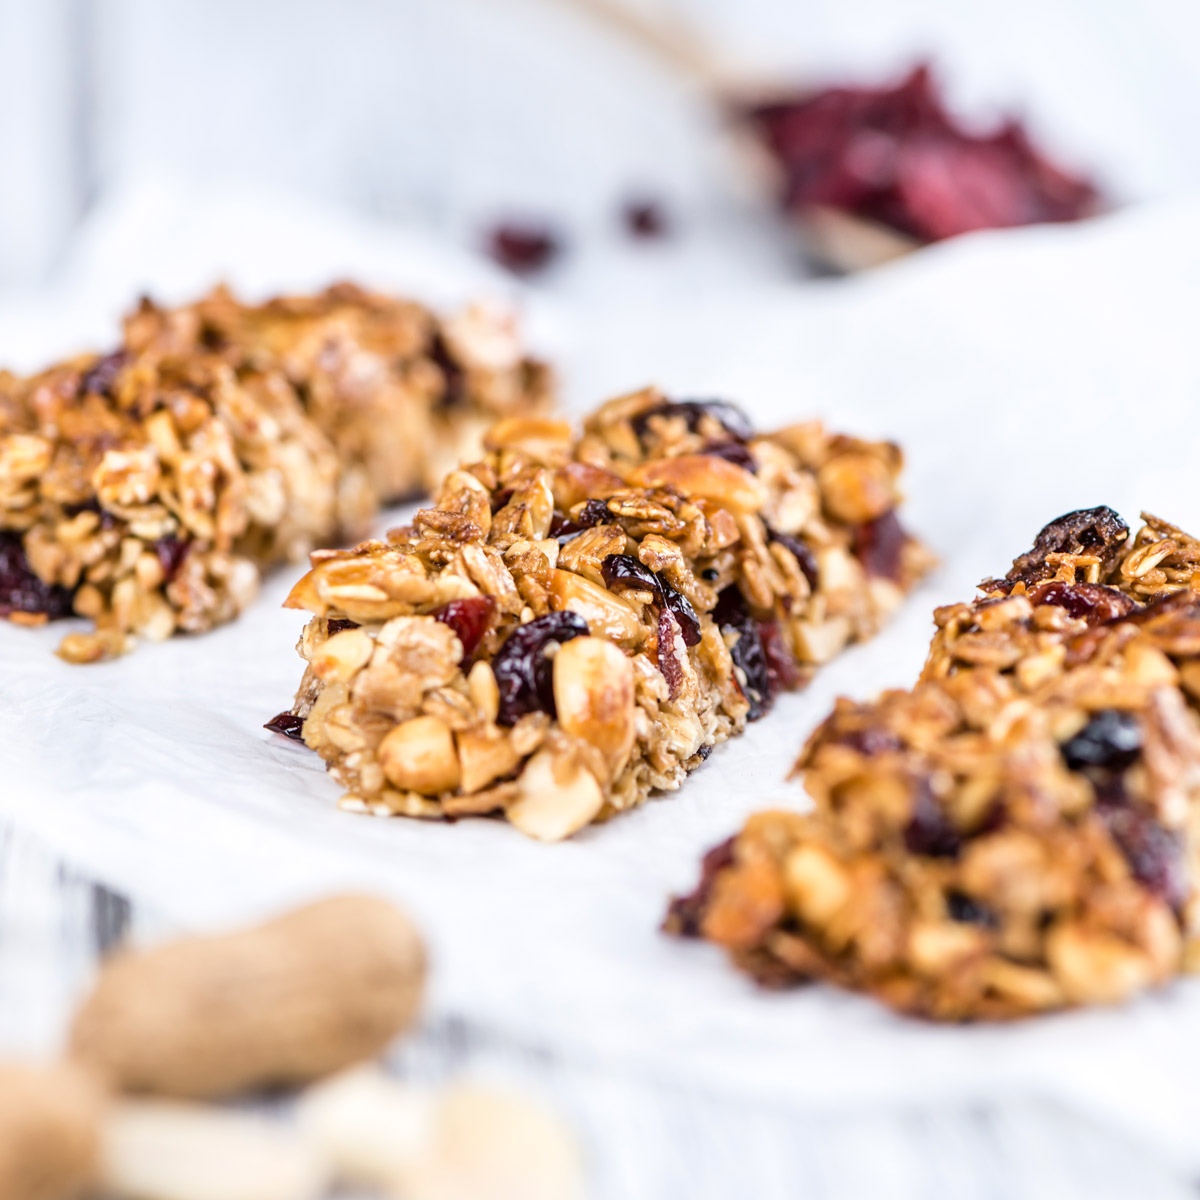 easy back-to-school snacks like granola bars